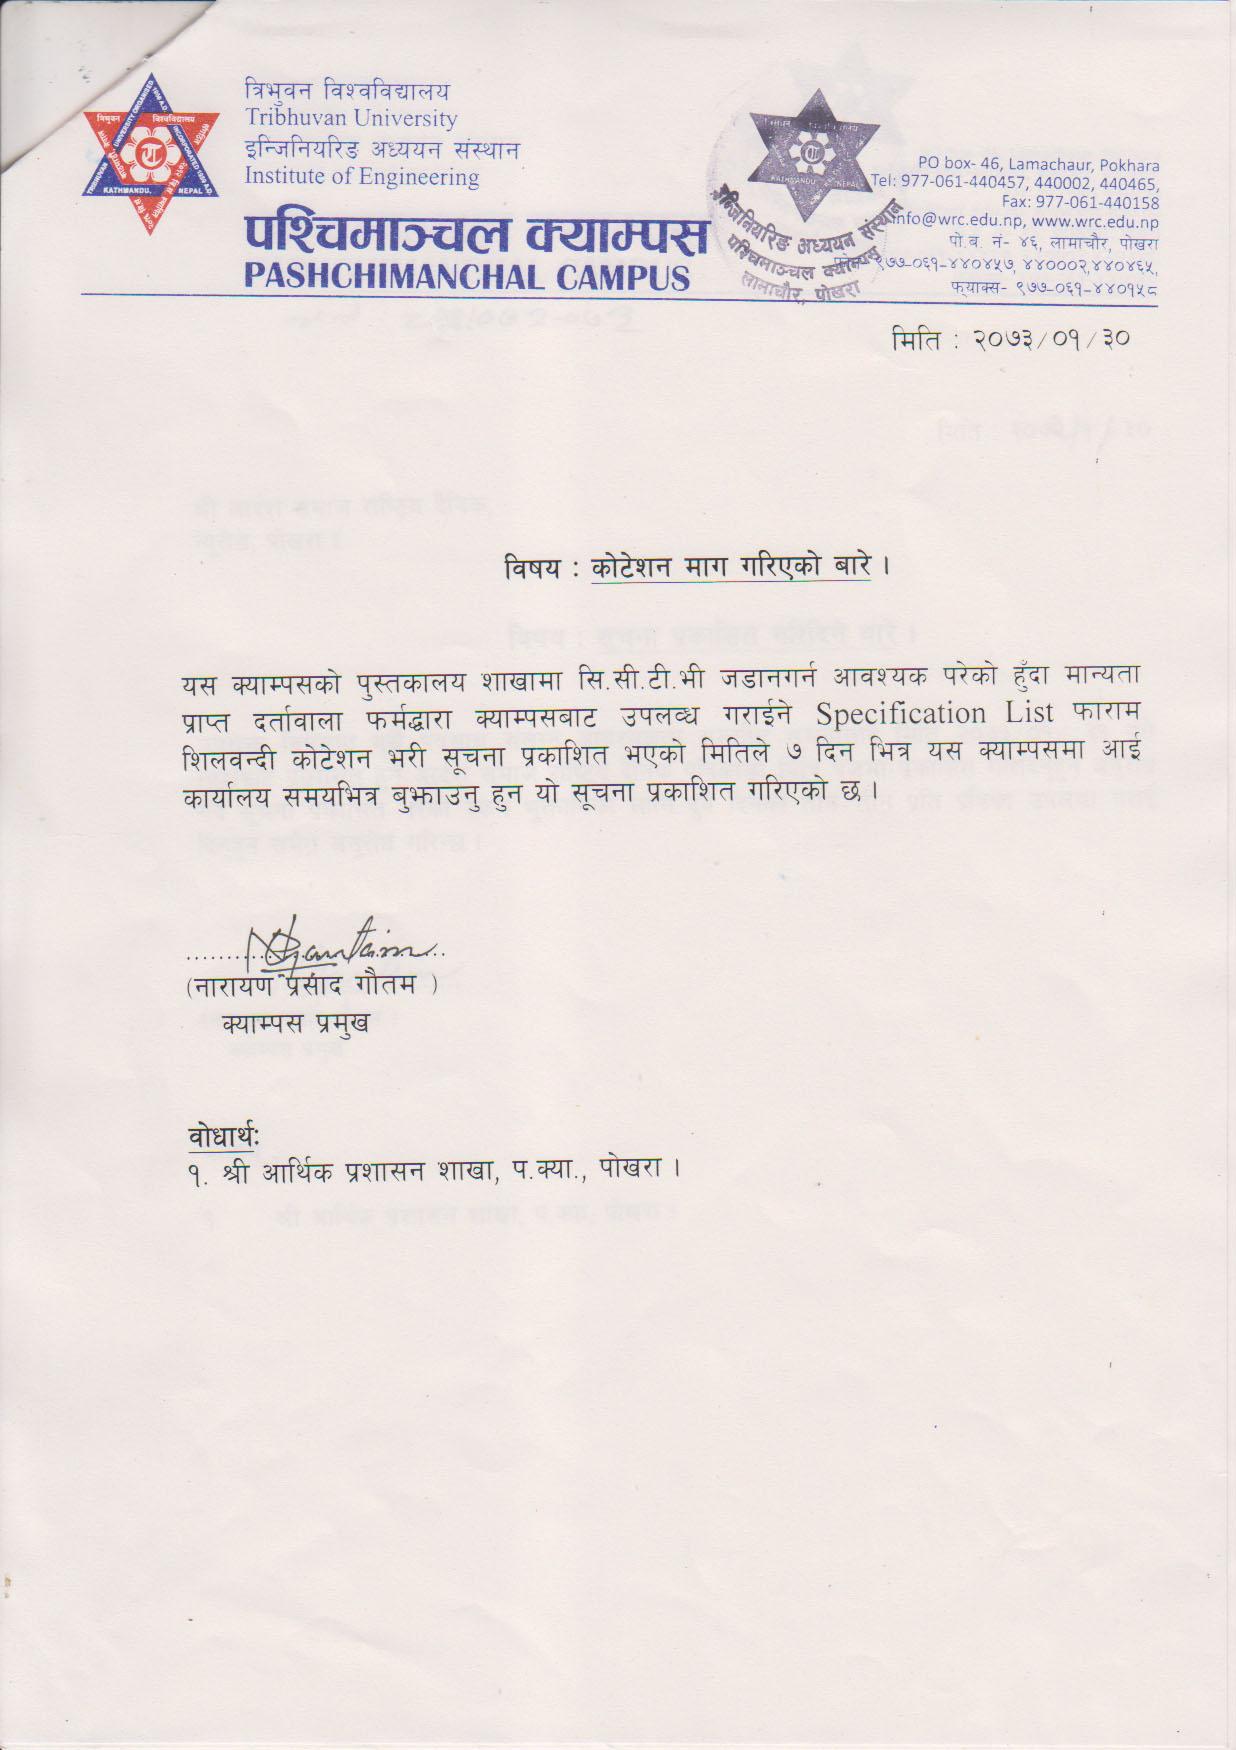 cctv letter